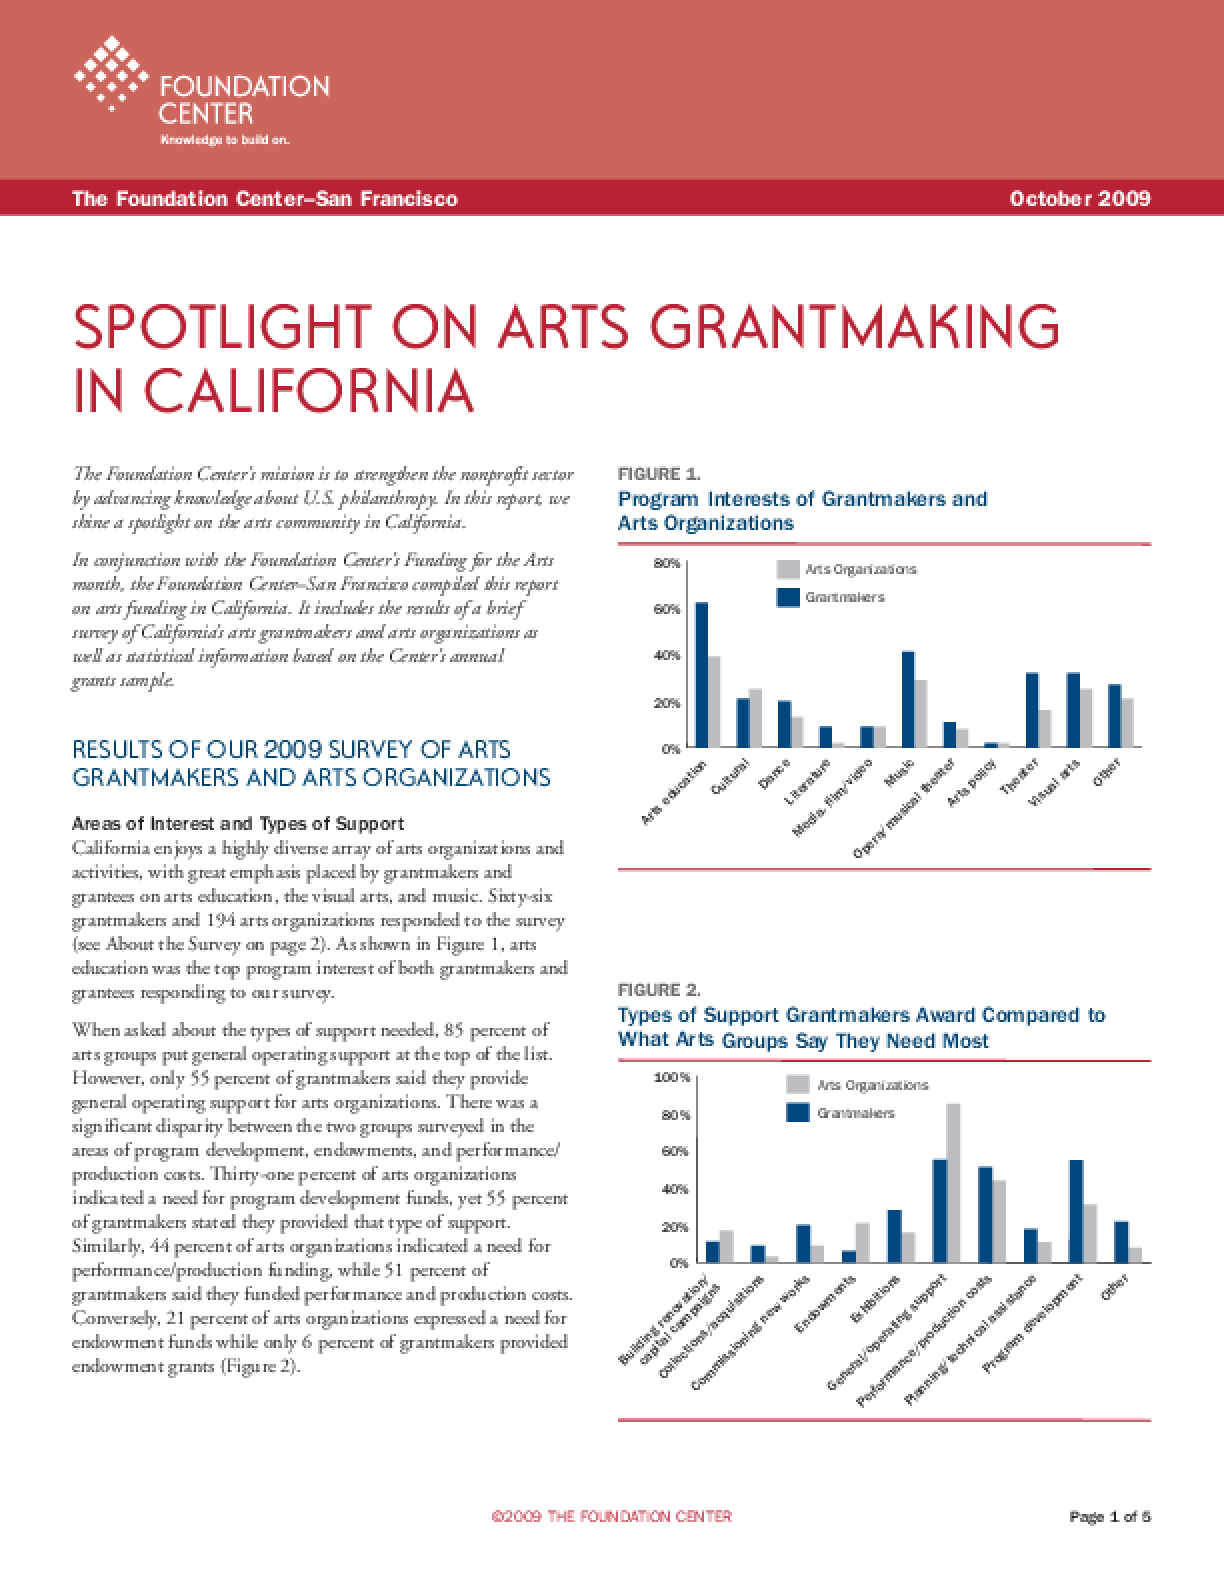 Spotlight on Arts Grantmaking in California 2009